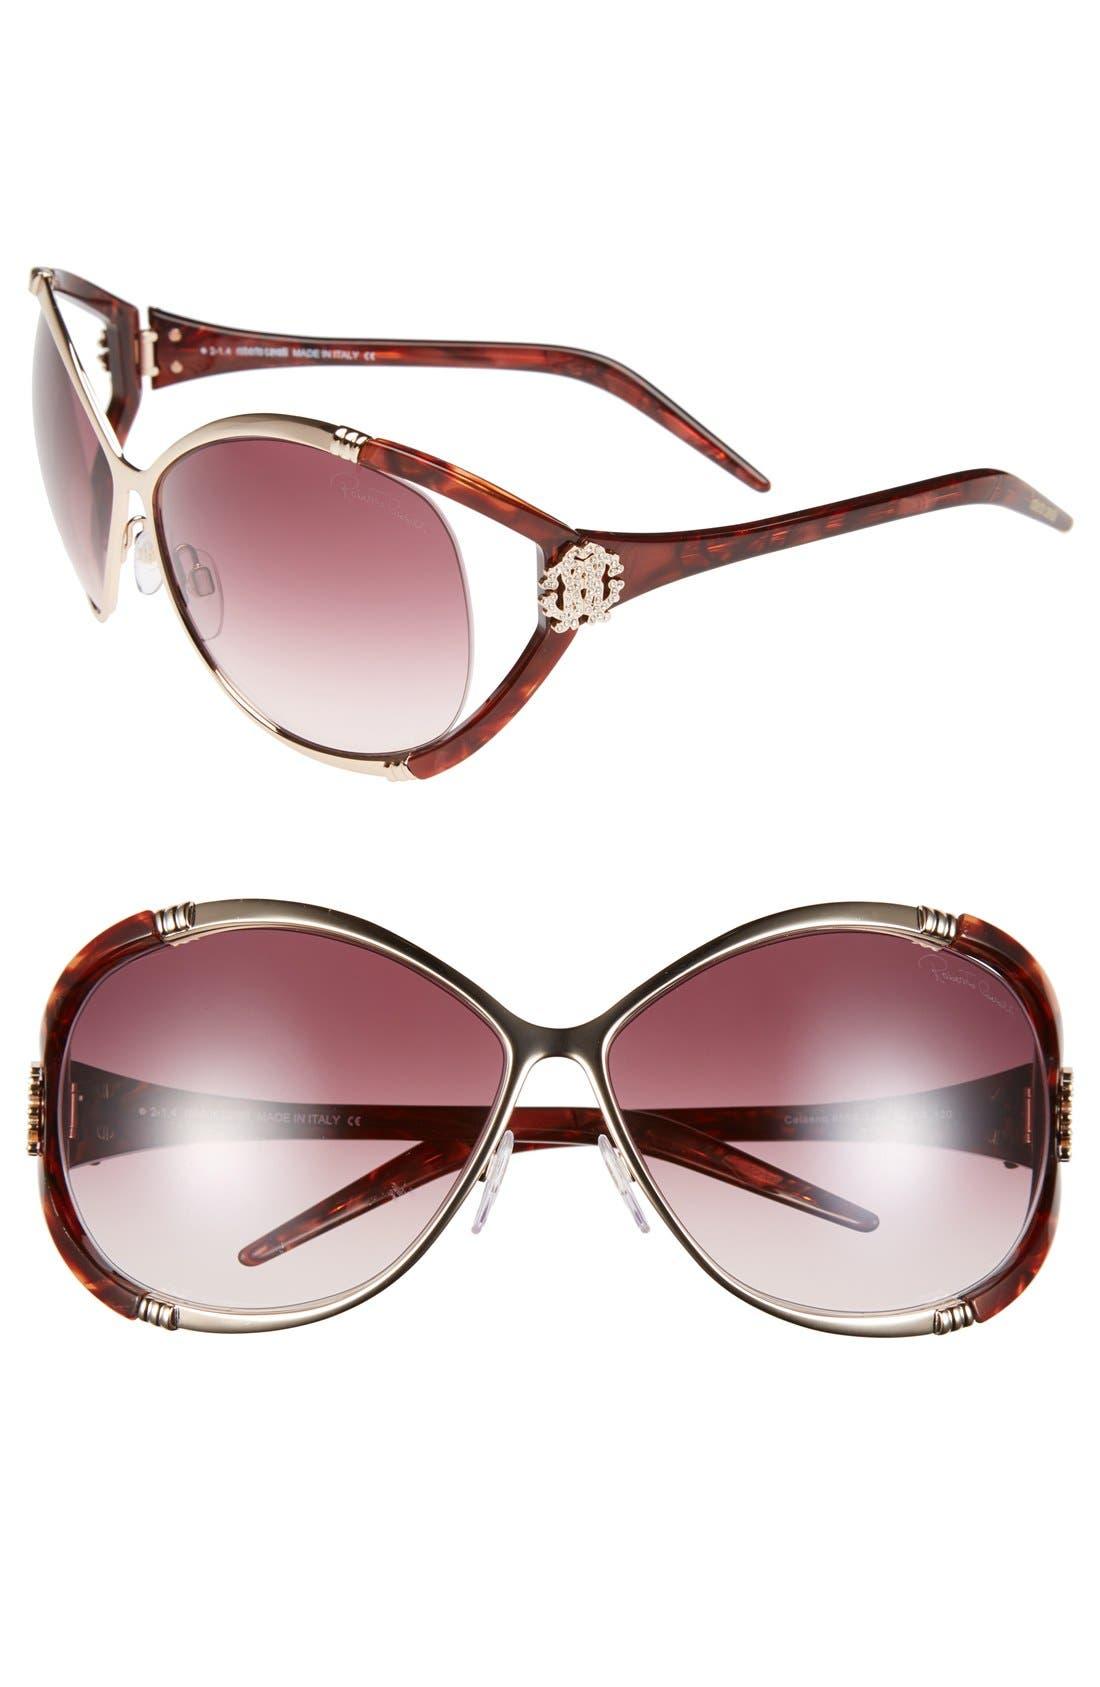 Alternate Image 1 Selected - Roberto Cavalli 'Celaeno - Glam Couture' 66mm Sunglasses